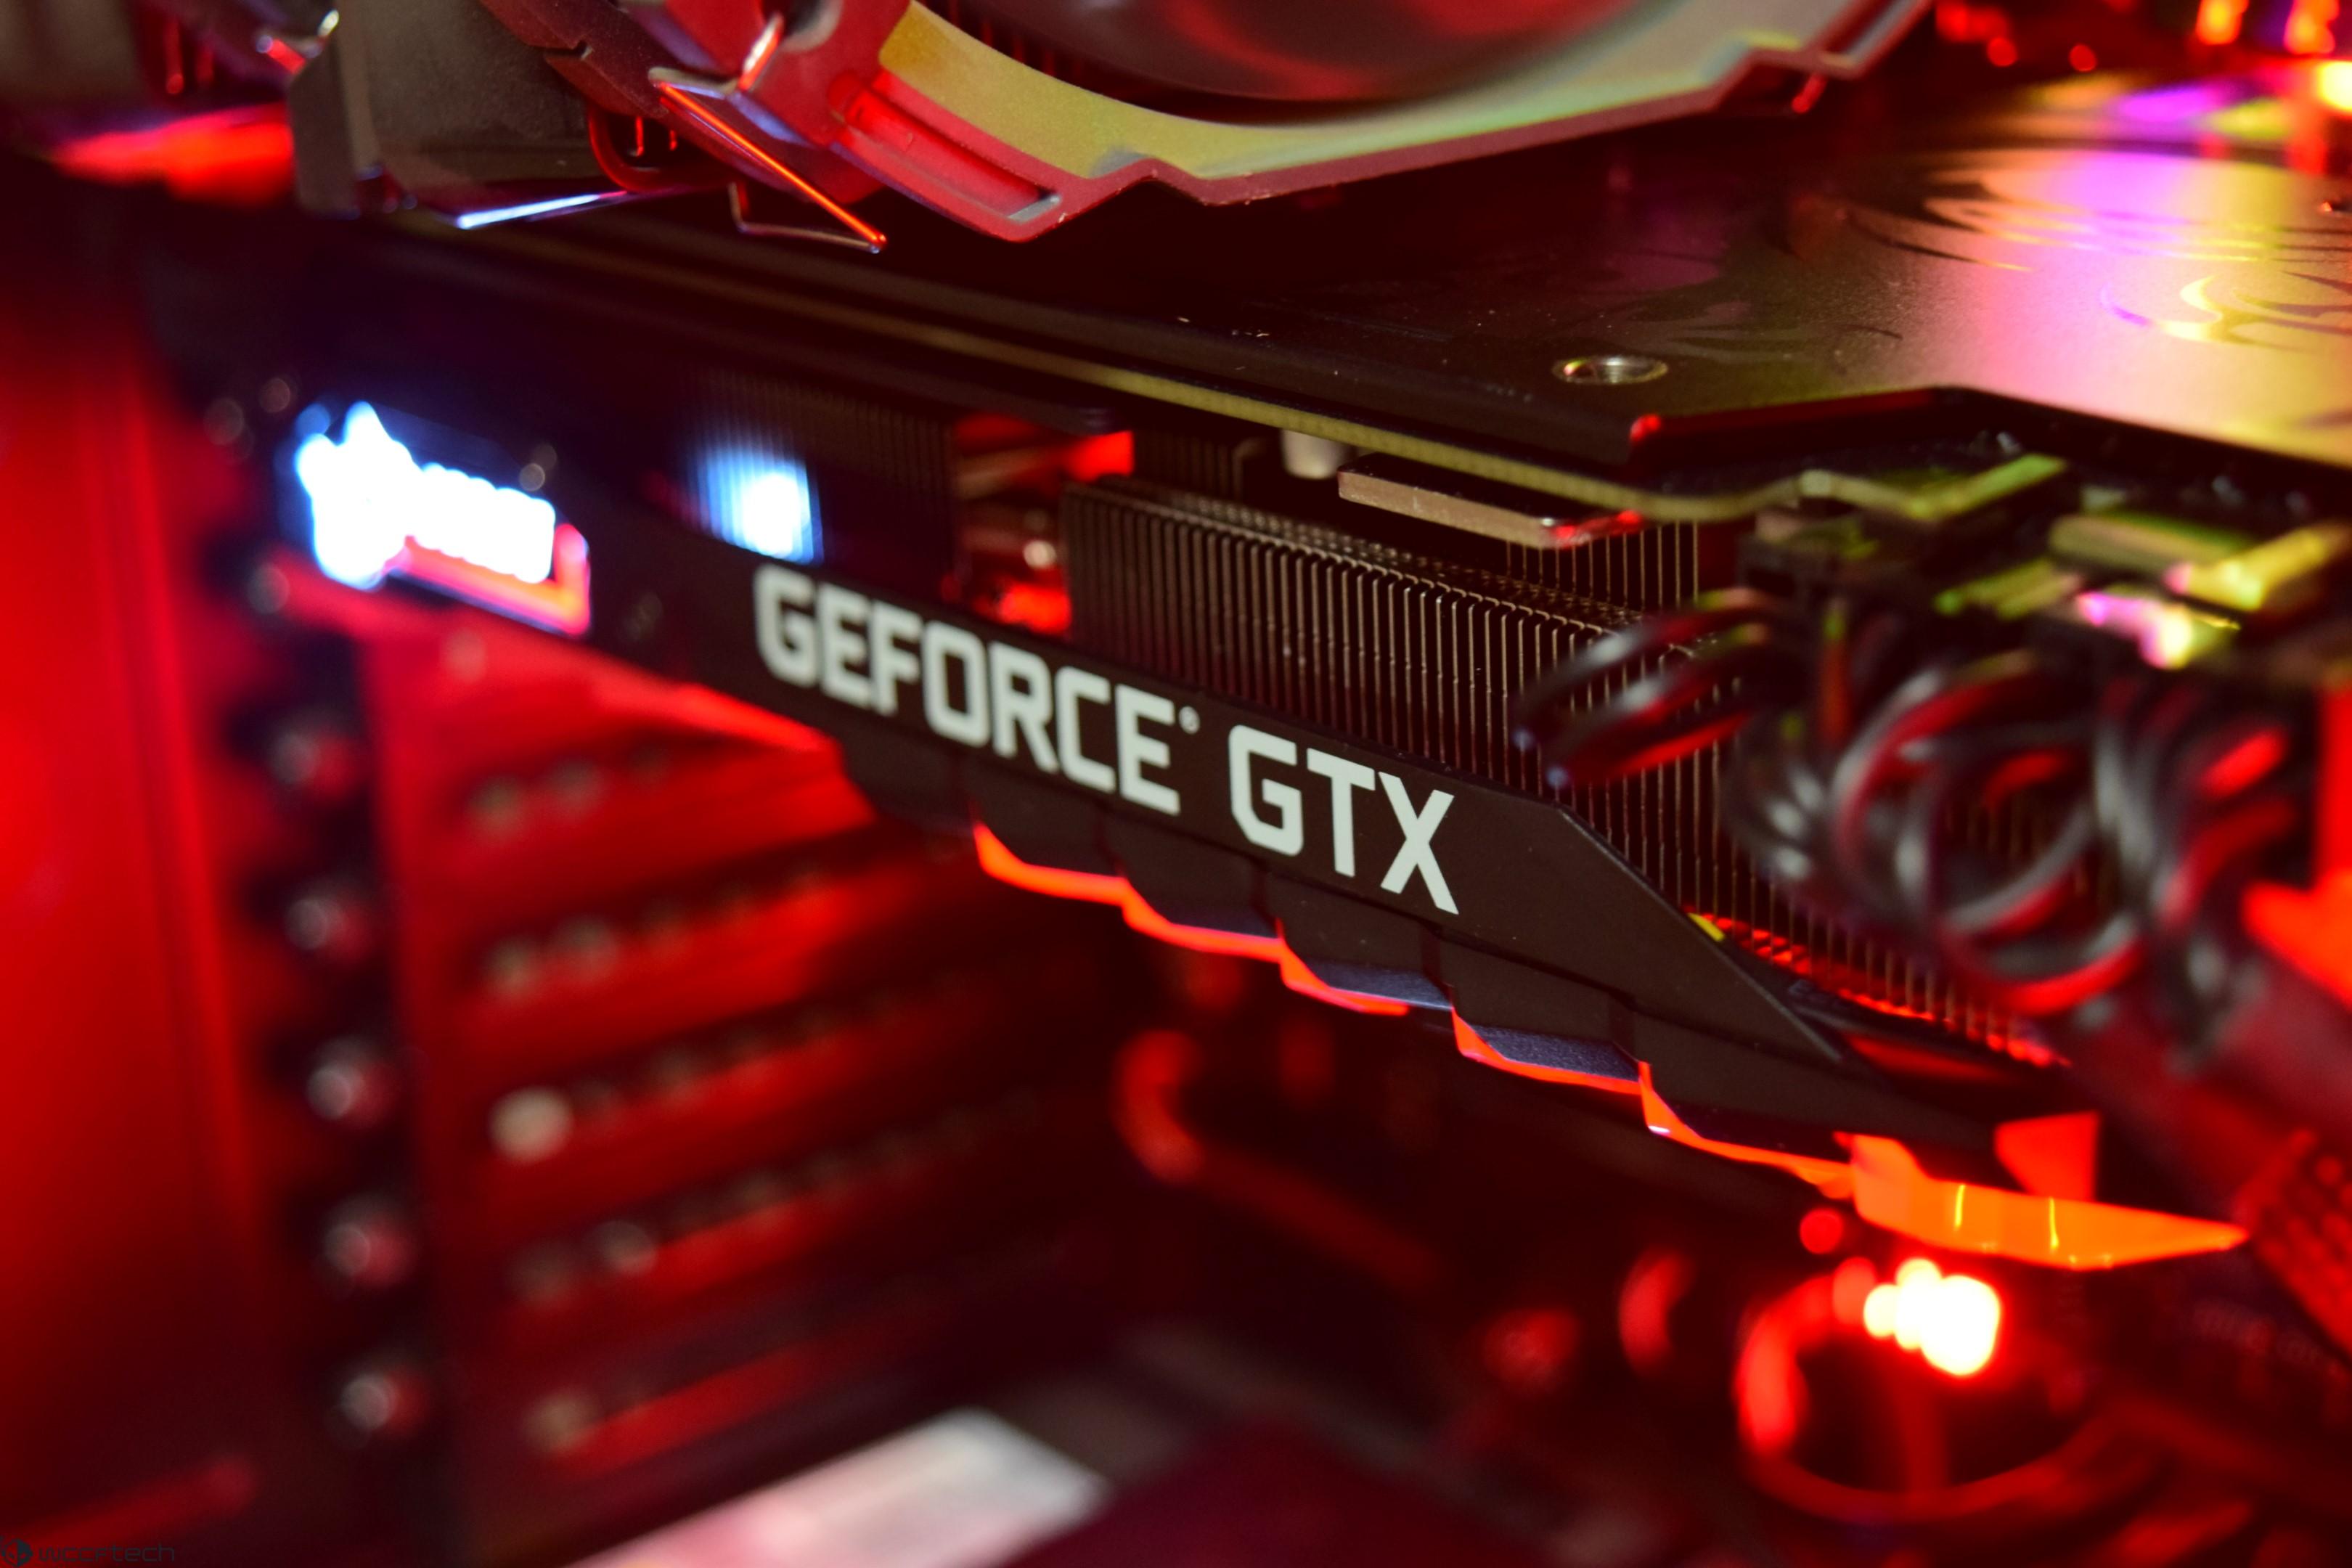 MSI GeForce GTX 1080 Ti Lightning X OC 11 GB Review – The